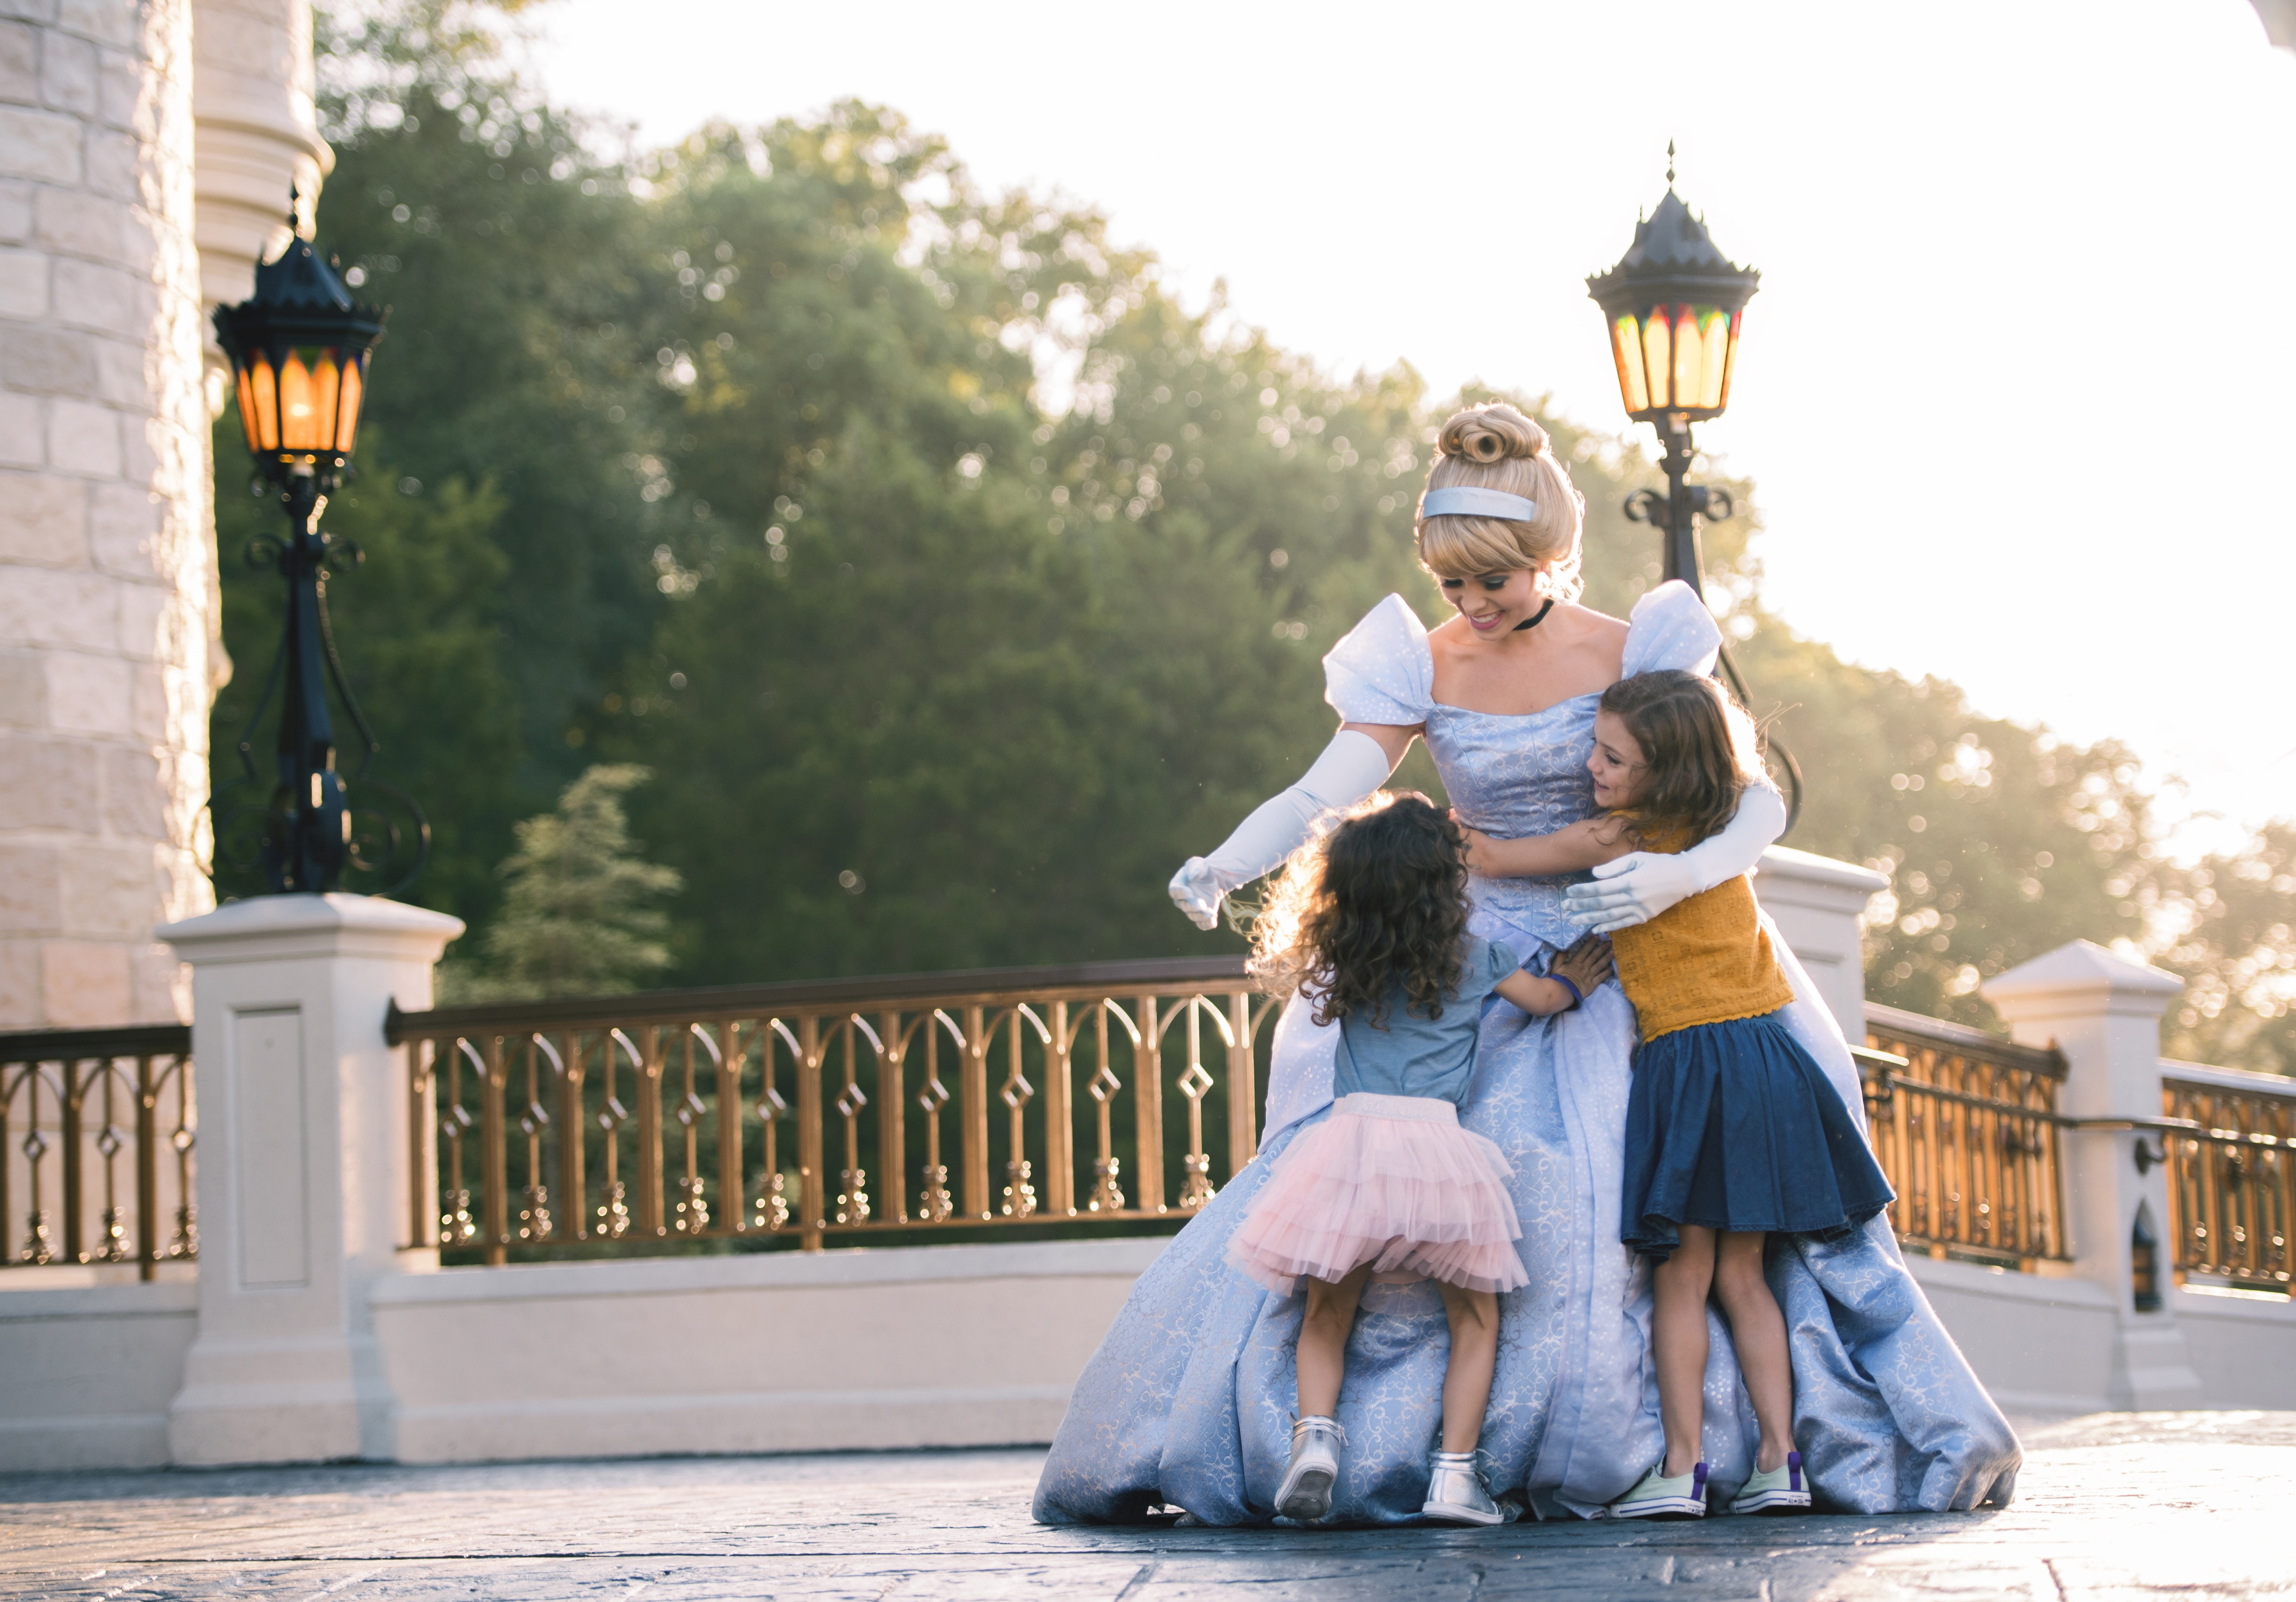 cinderella-magic-kingdom-park